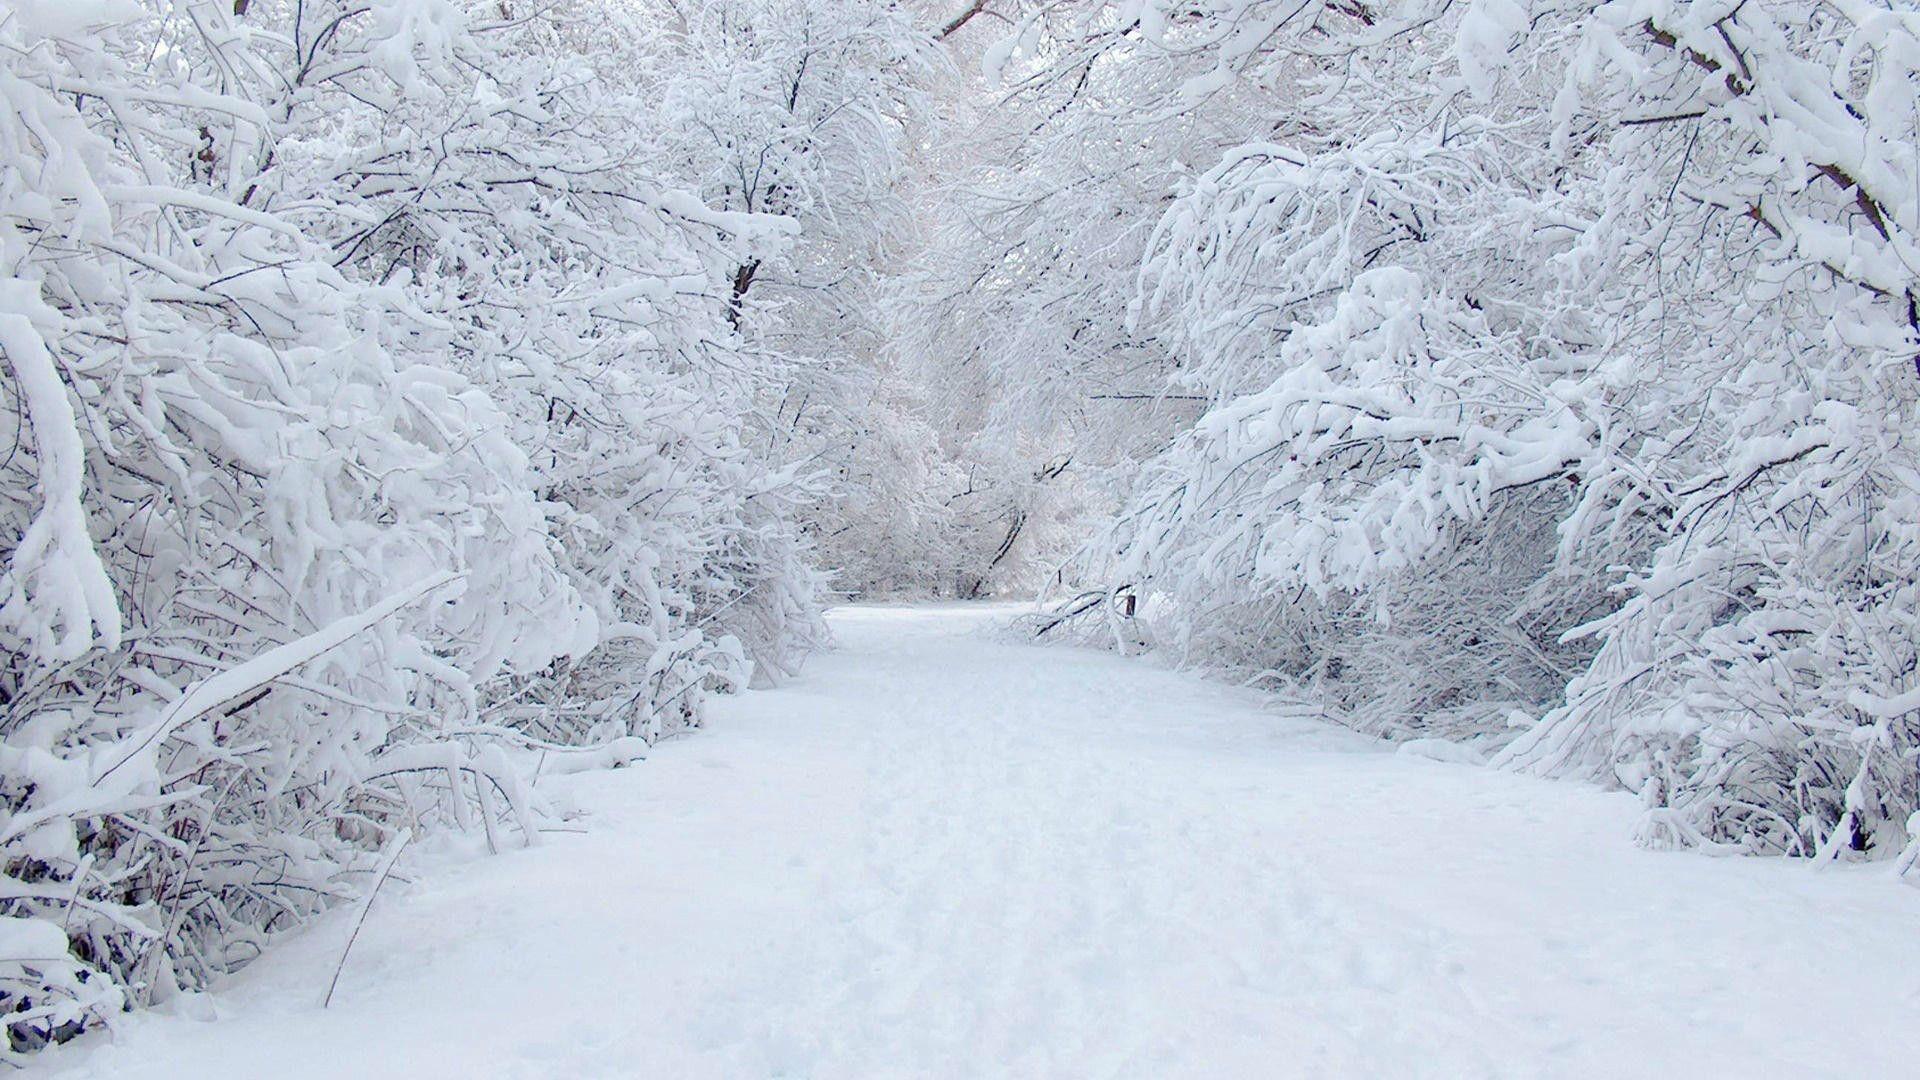 1920x1080, Free Winter Scenery Wallpaper - Winter Wonderland Background - HD Wallpaper